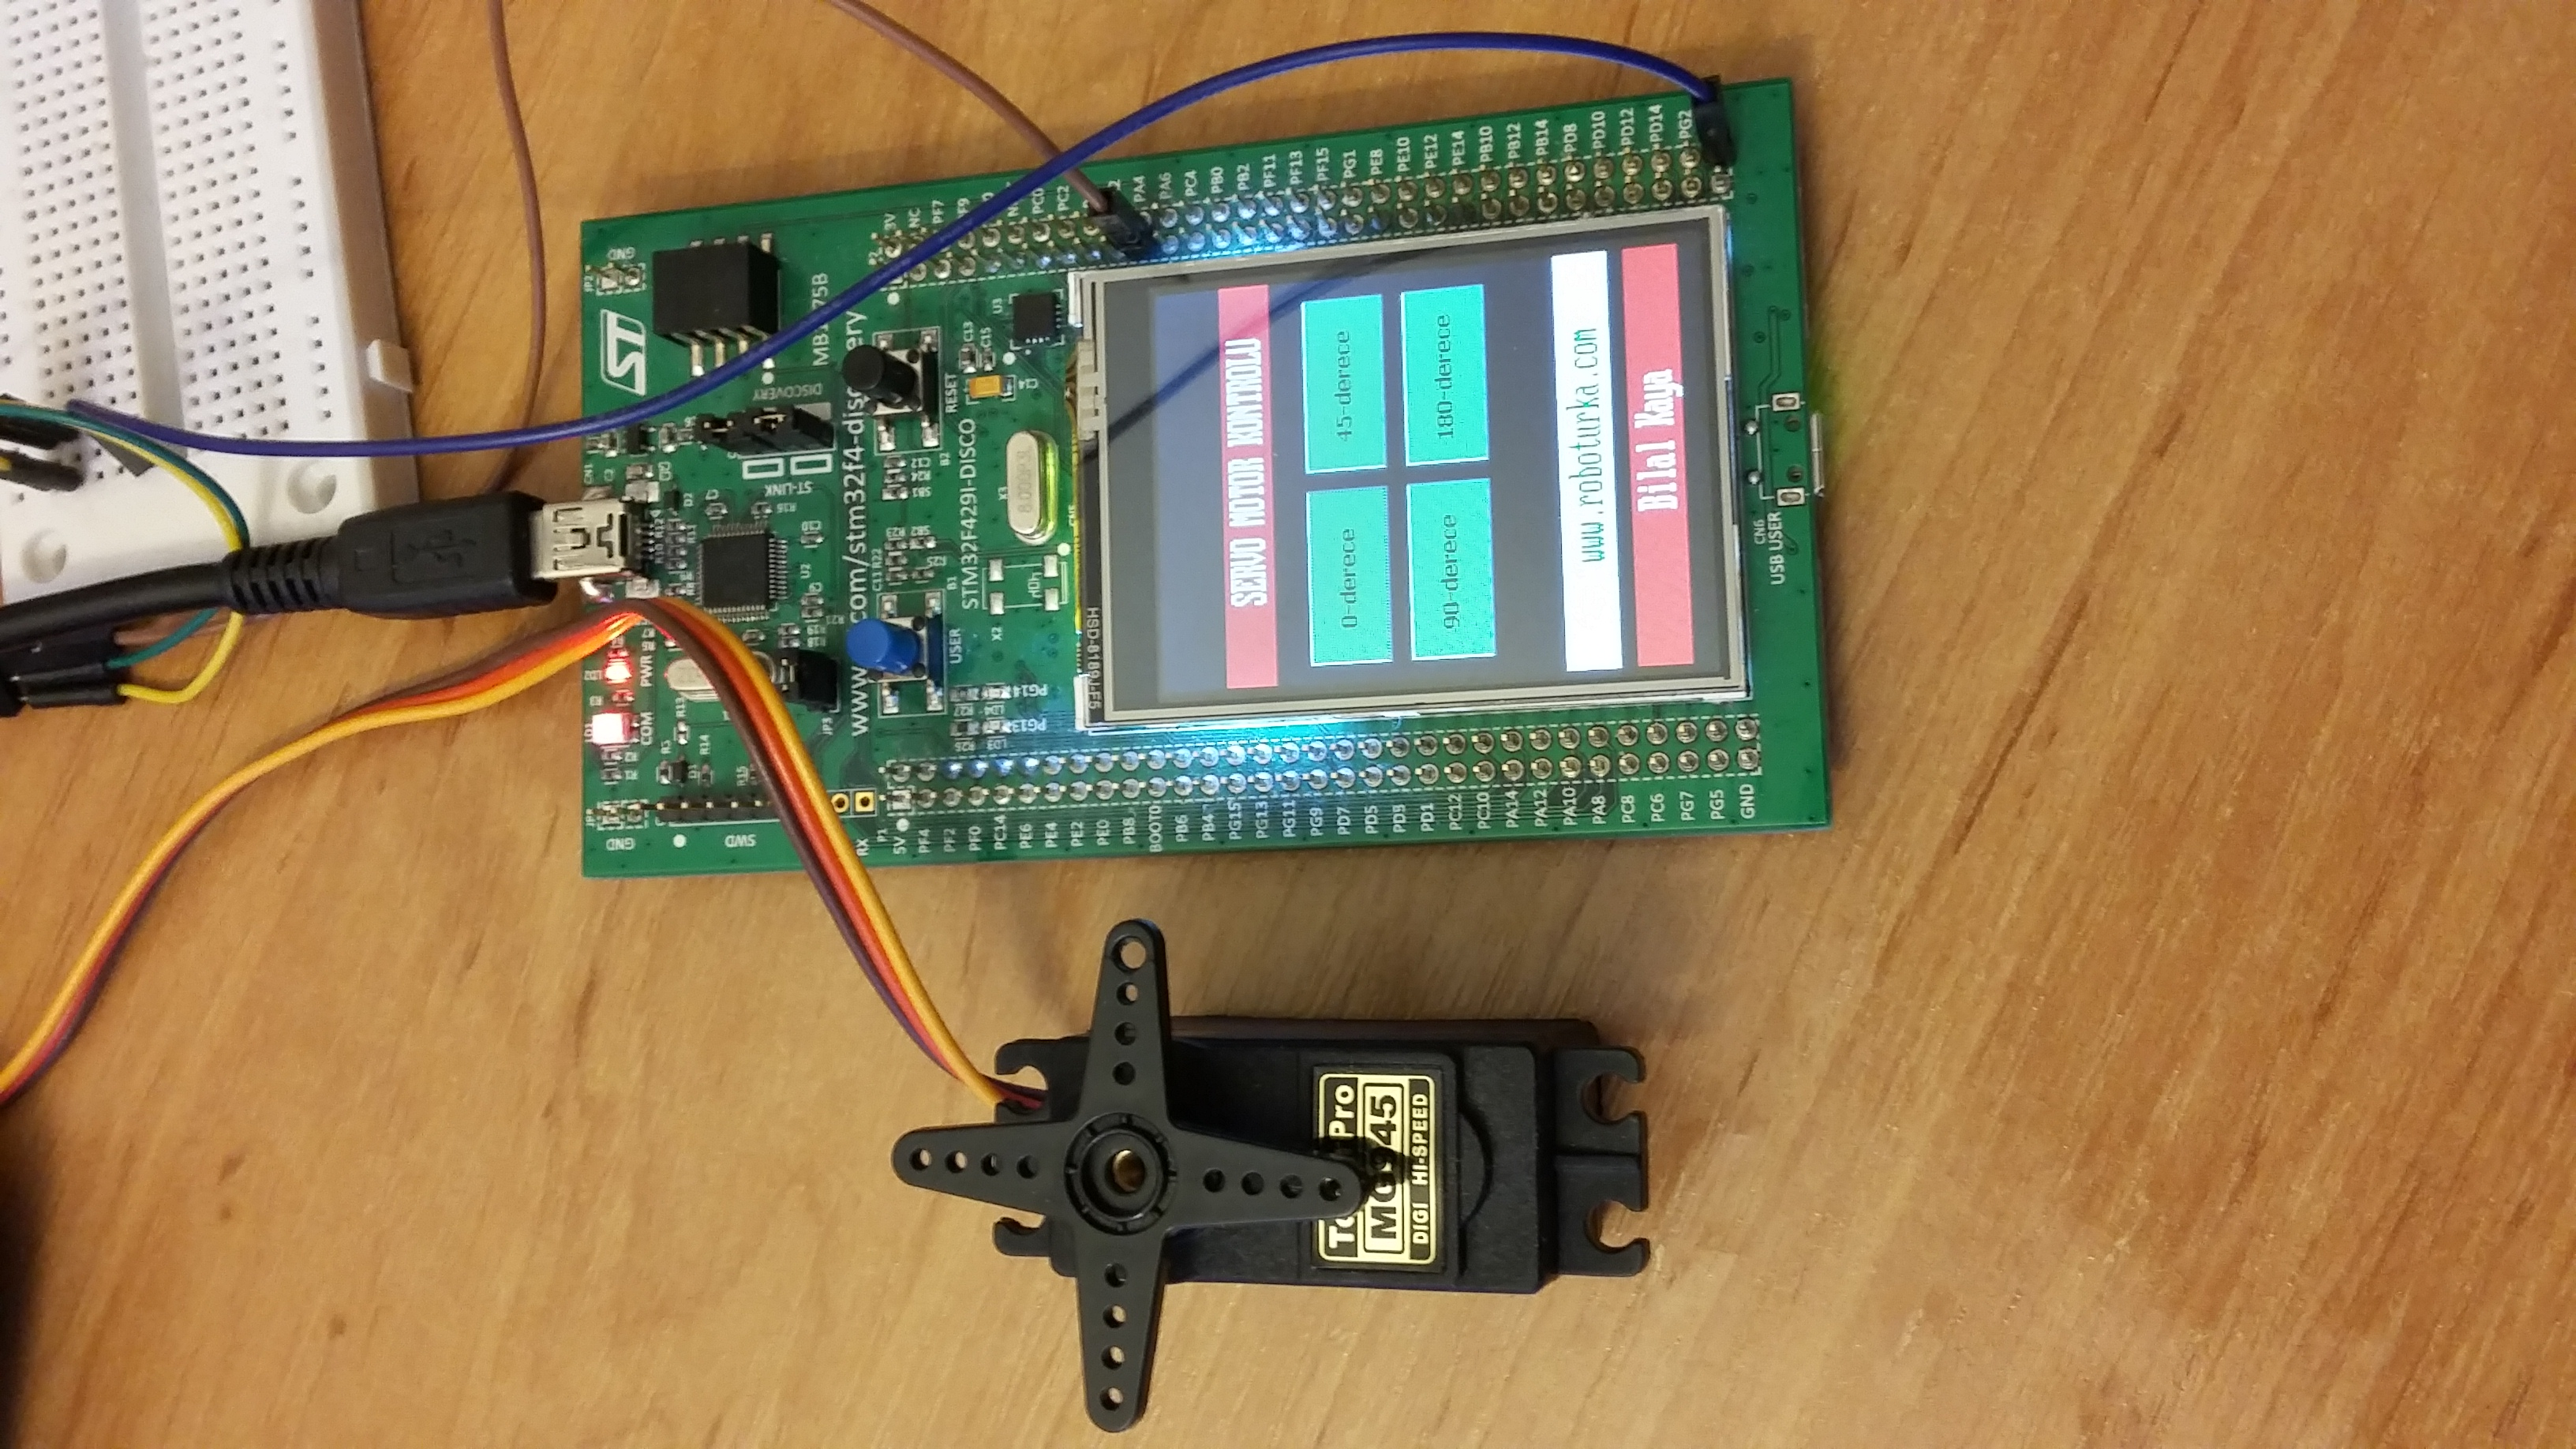 Dokunmatik ekranla servo motor kontrolü roboturka